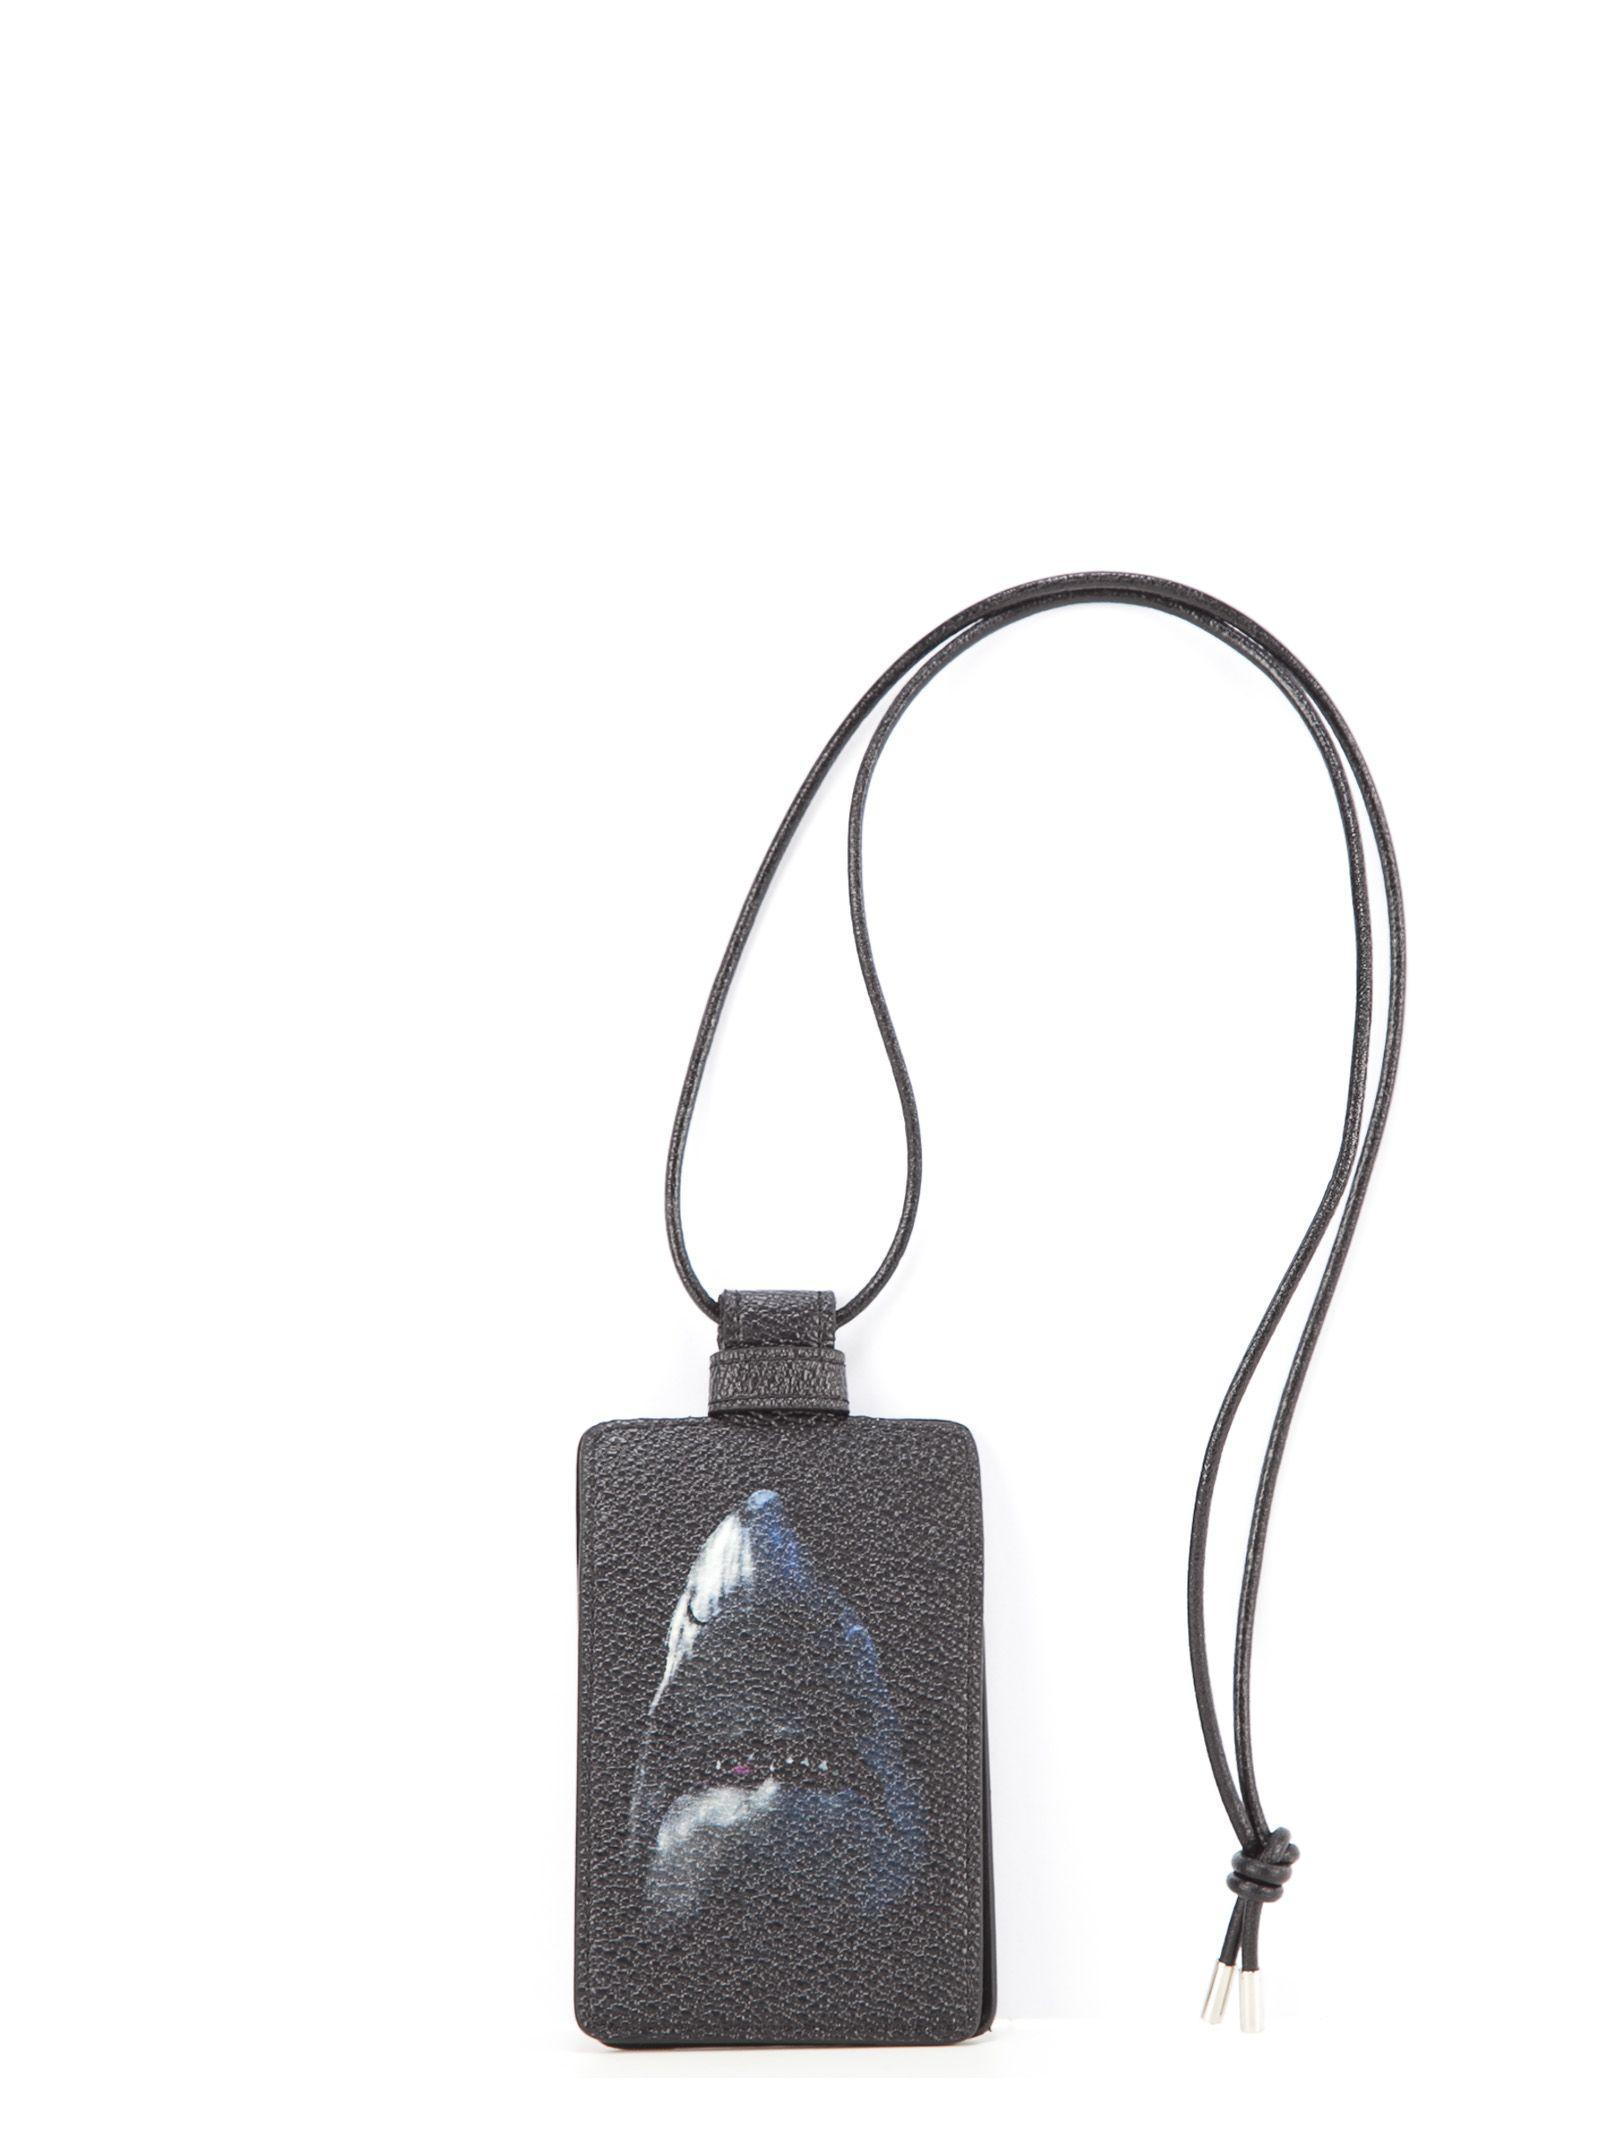 Givenchy Shark Card Holder In Black